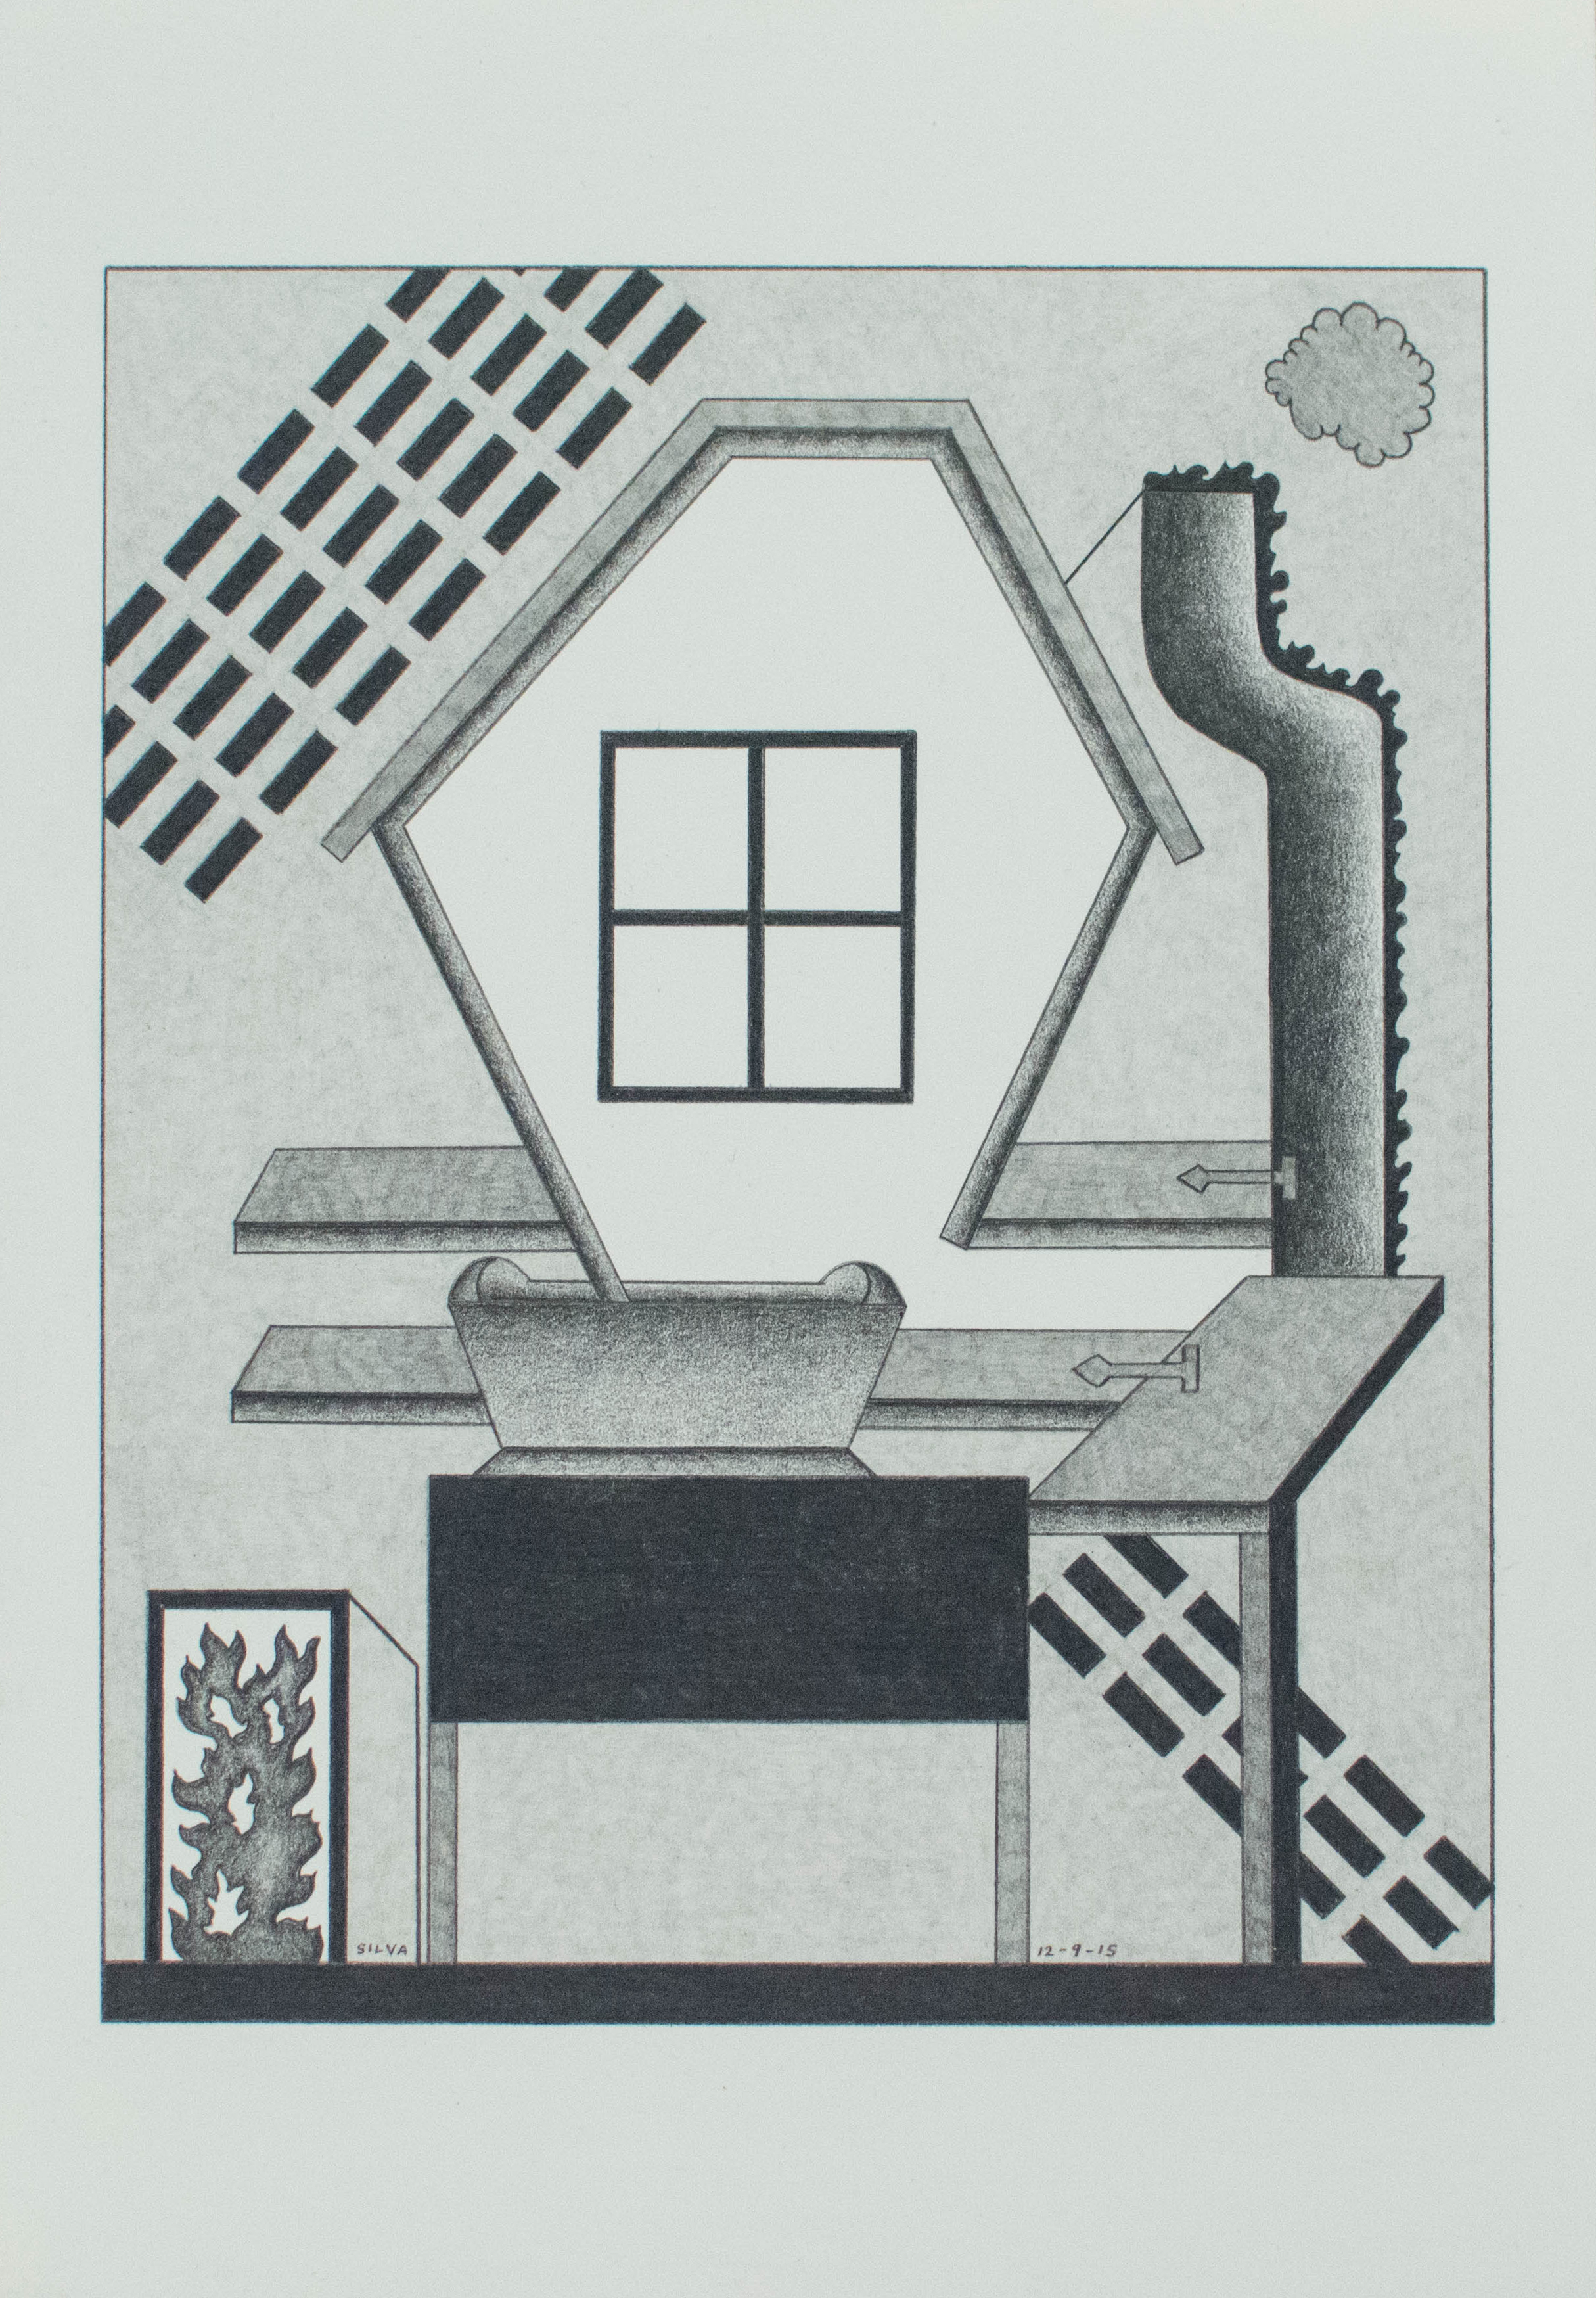 12-9-15, 2015, Graphite on paper, 7 x 10 inches